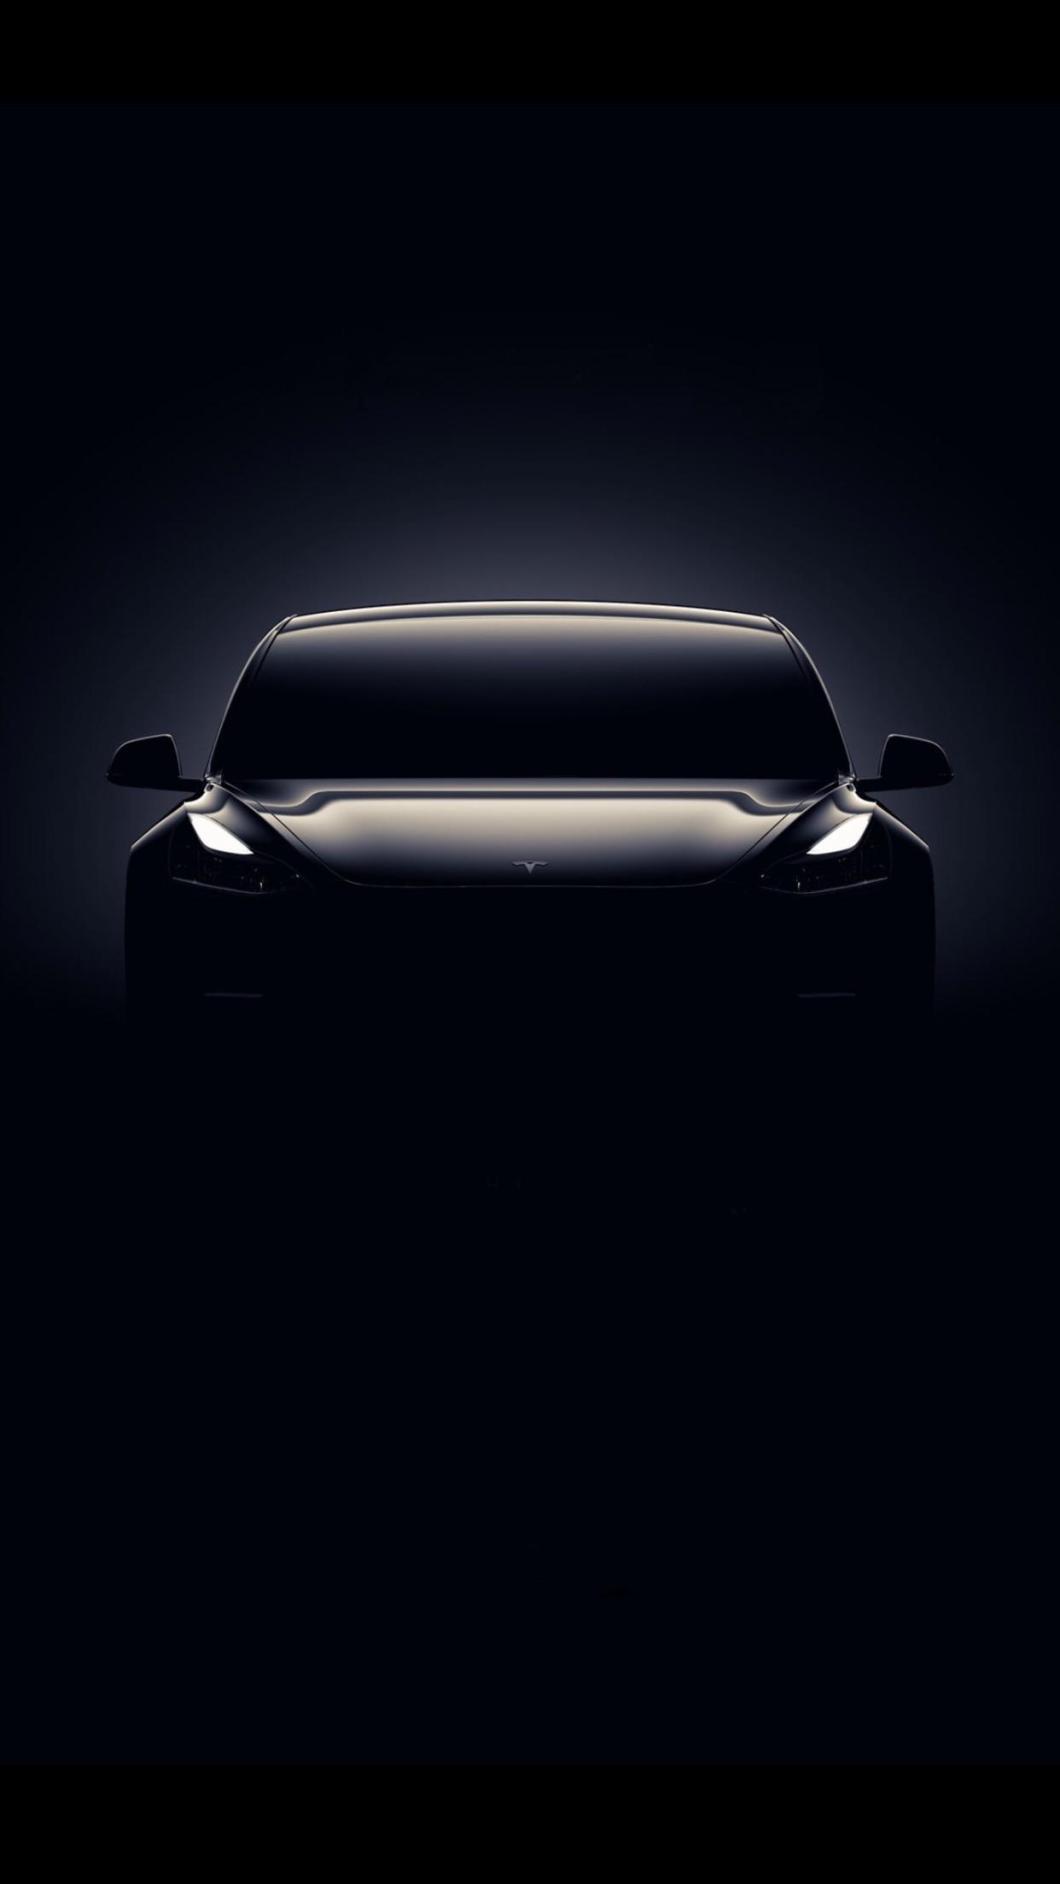 Tesla phone Wallpapers